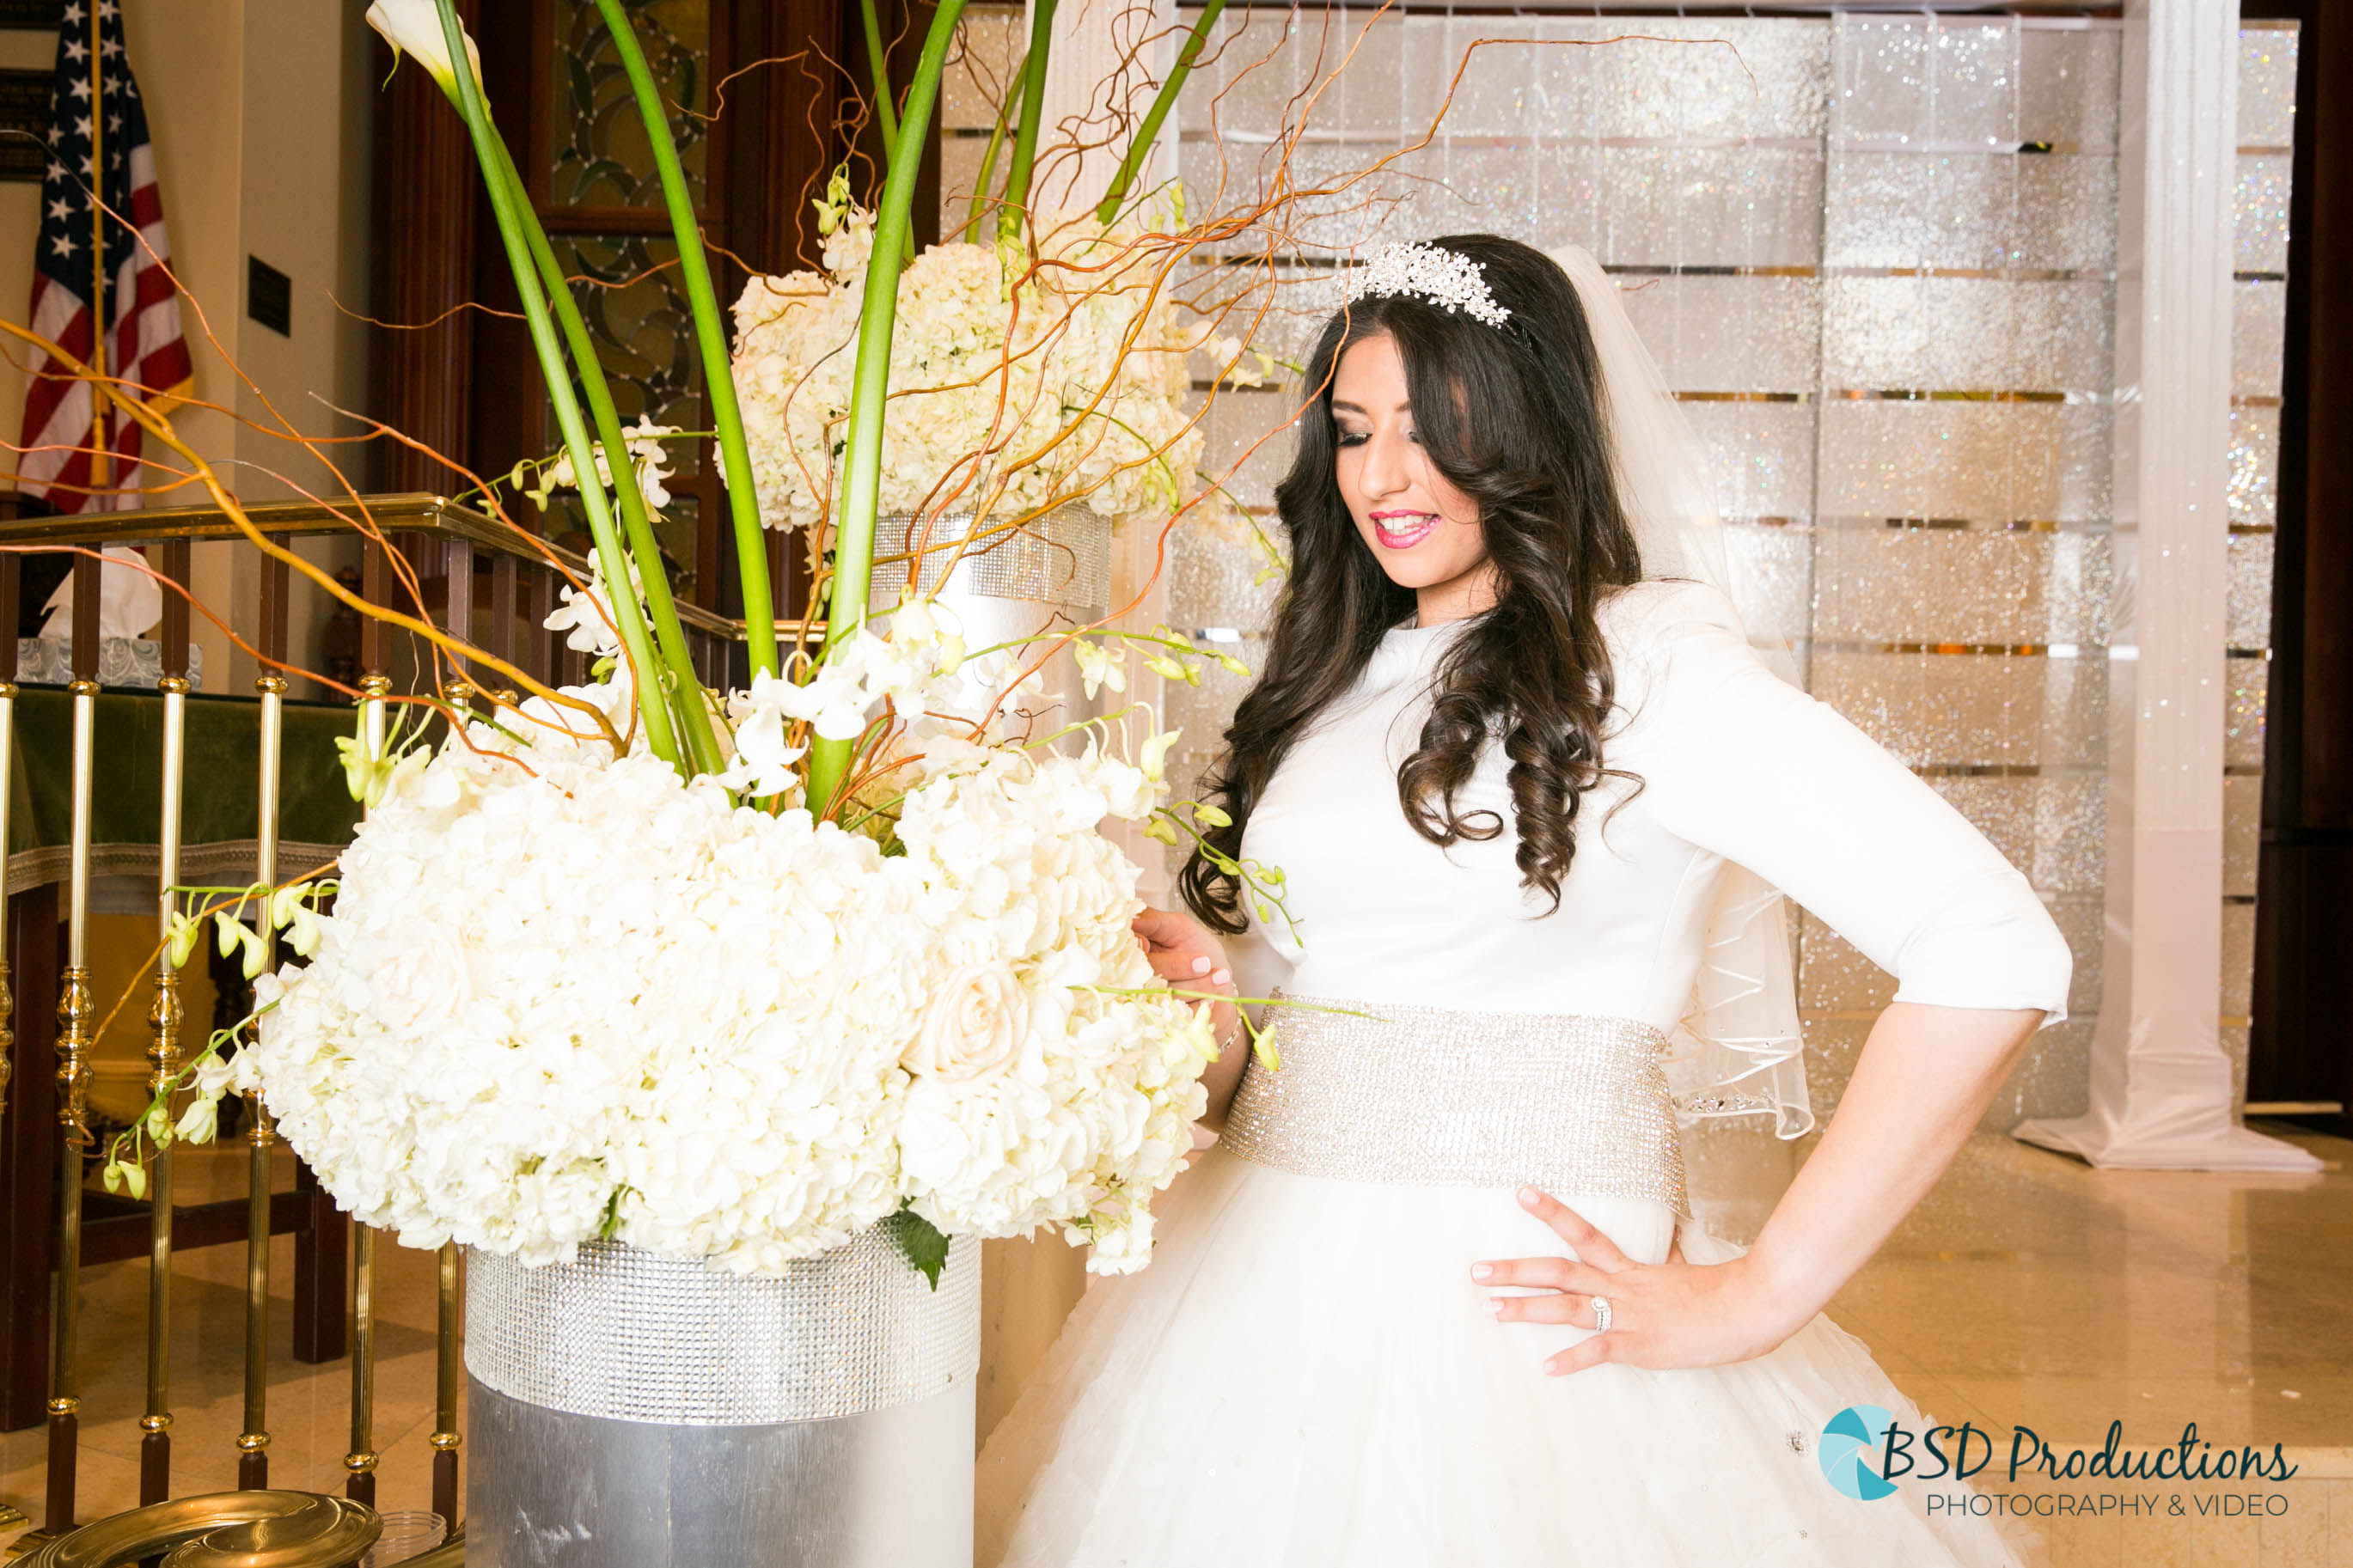 DAV_4270 Wedding – BSD Productions Photography